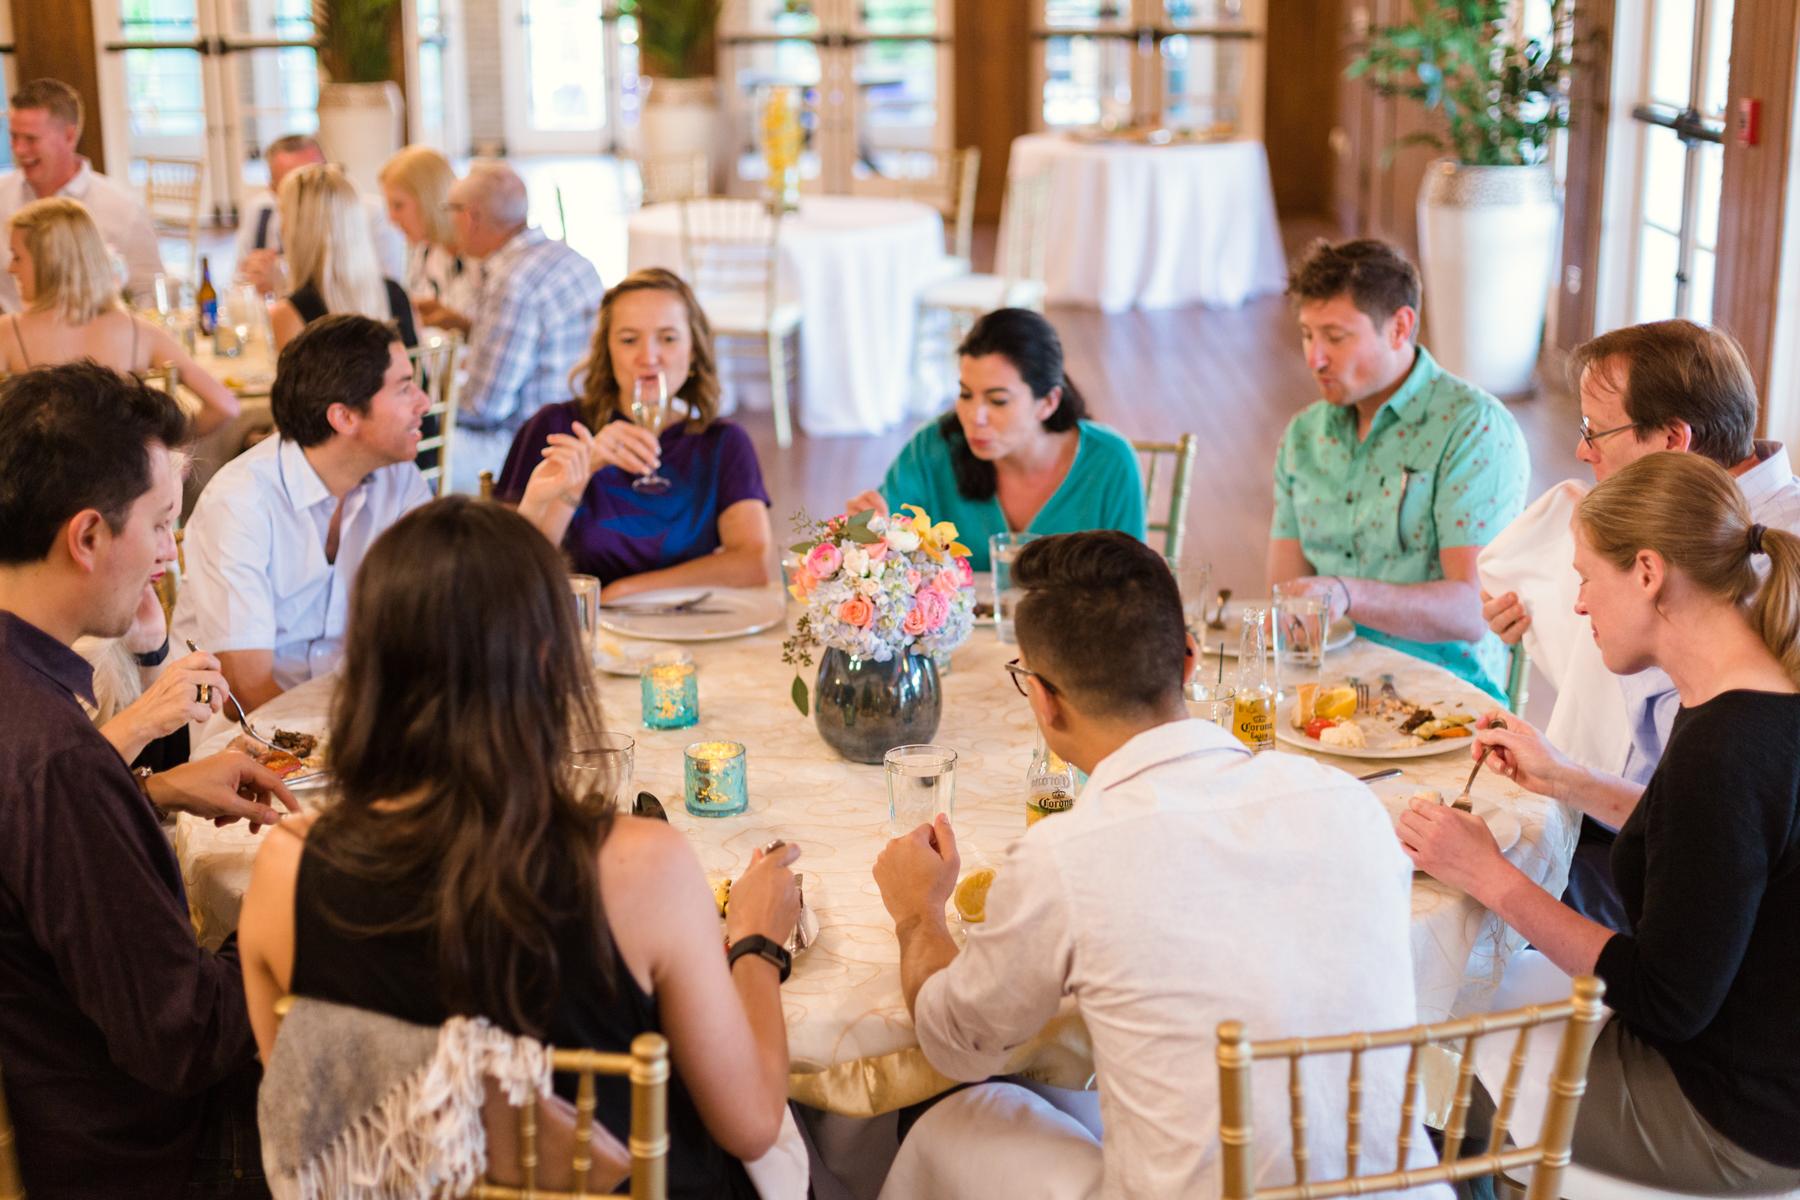 South-Florida-Events-Photographer-Rehearsal-Dinner-Photography-Miami-Beach-Womens-Club